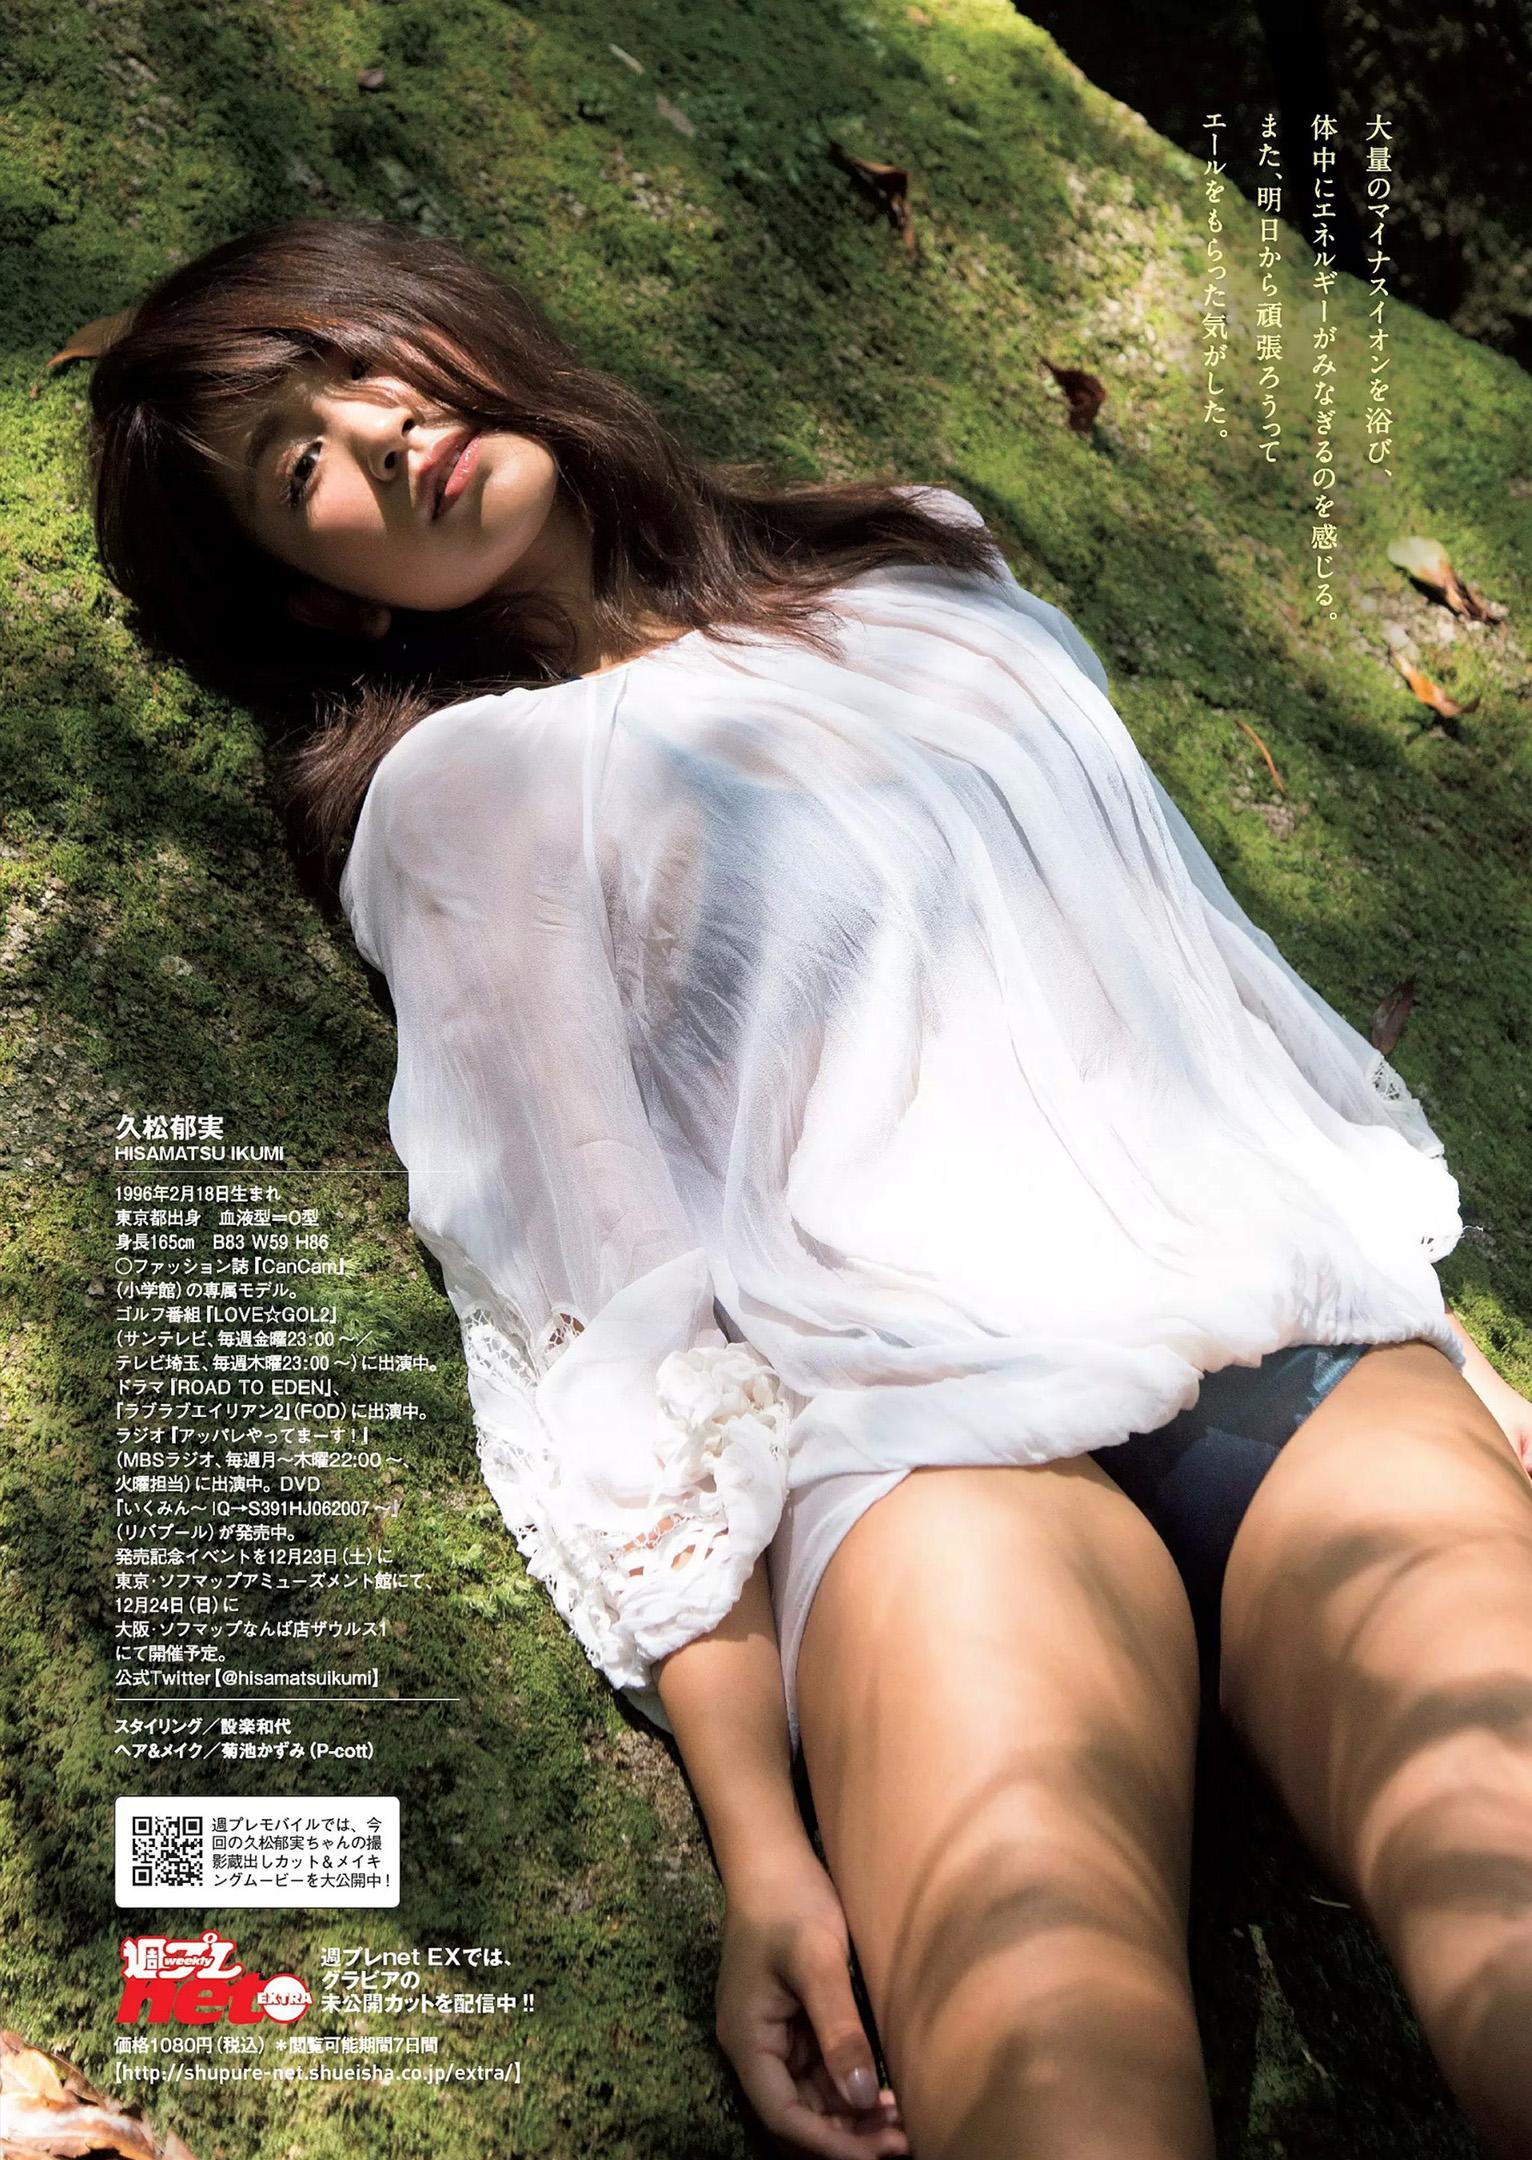 히사마츠 이쿠미(久松郁実, ひさまつ いくみ) - 주간 플레이보이 2017 No.52